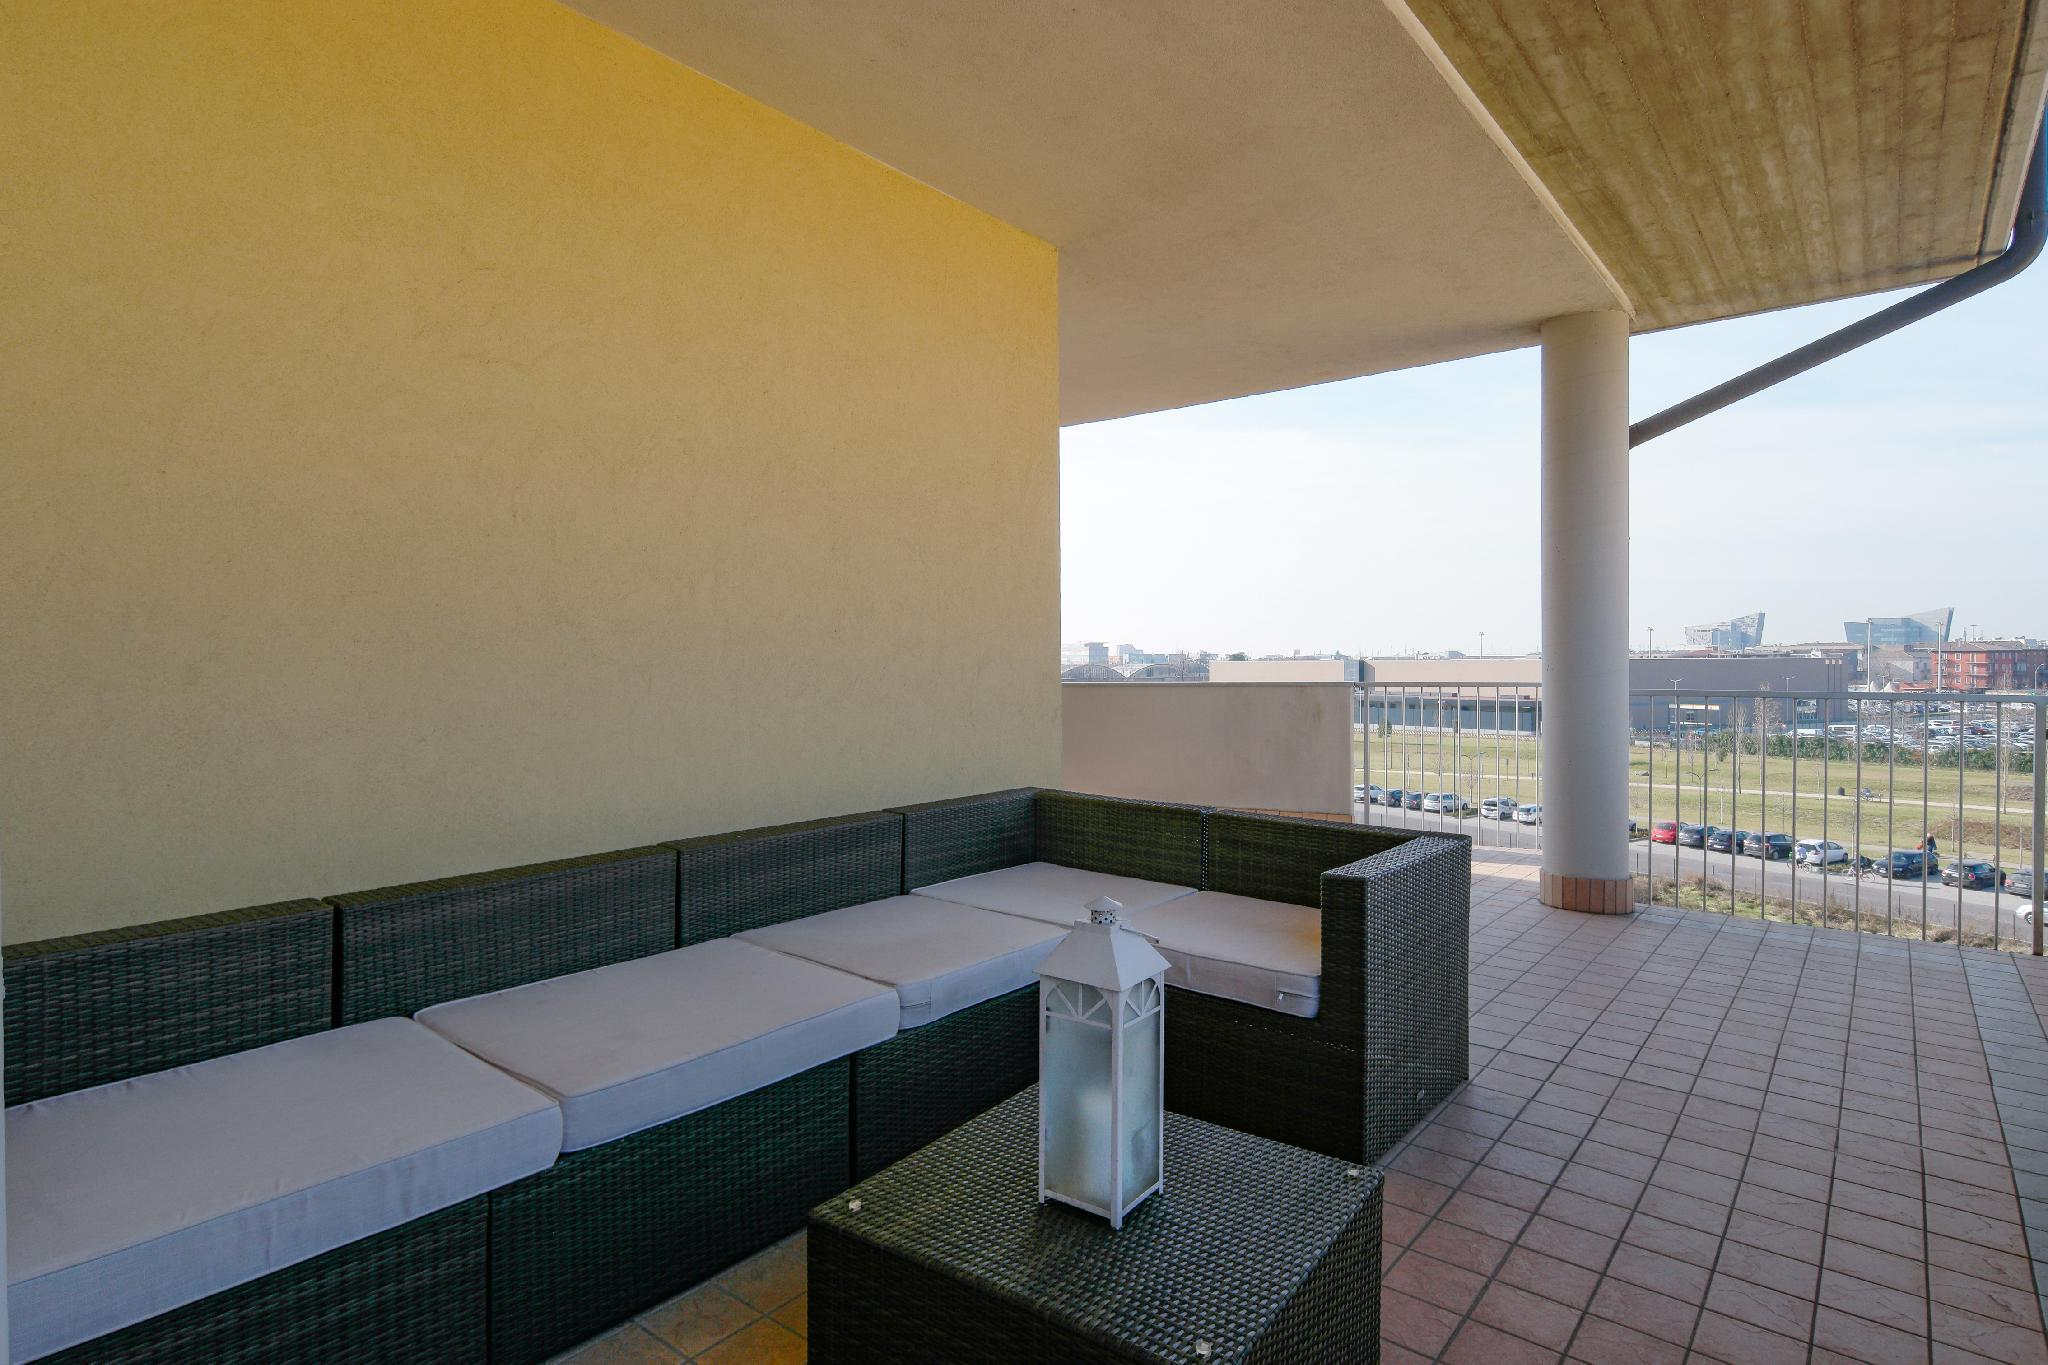 Attico Fiera Duplex With Large Terrace